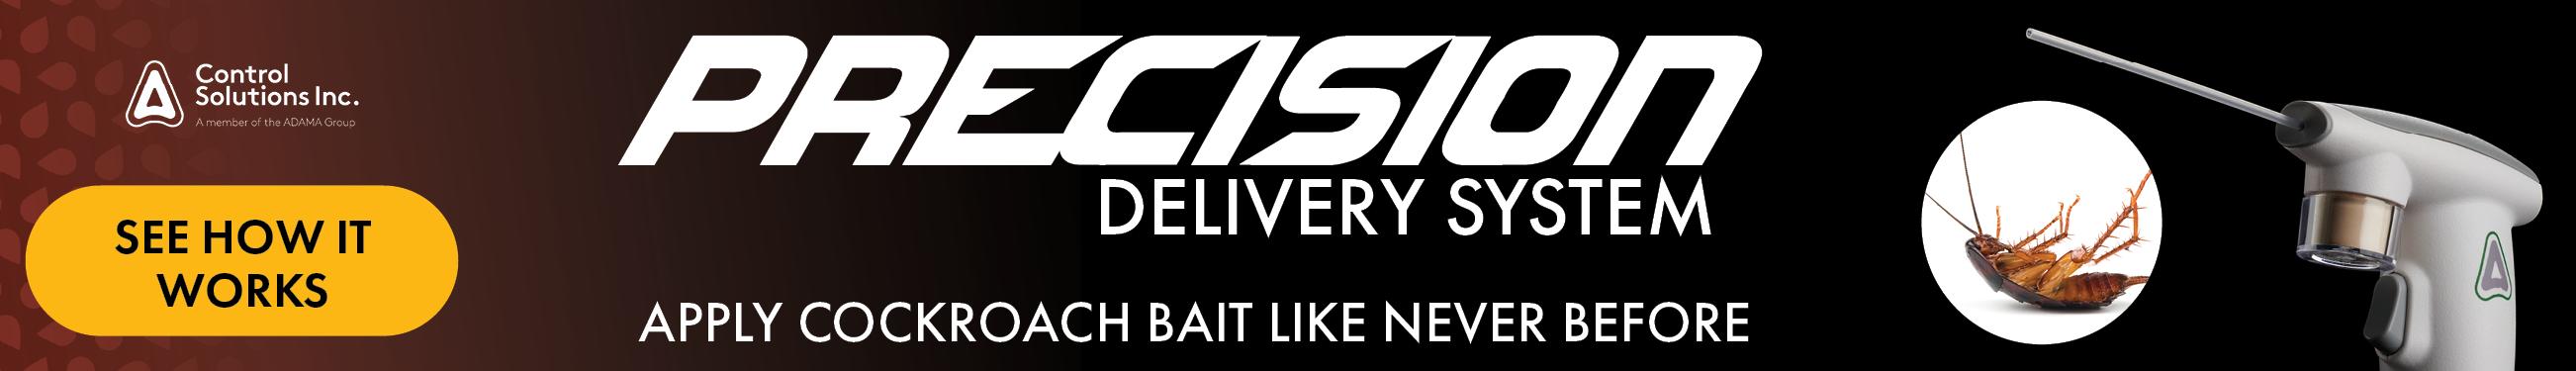 Visit CSI-PDS.com